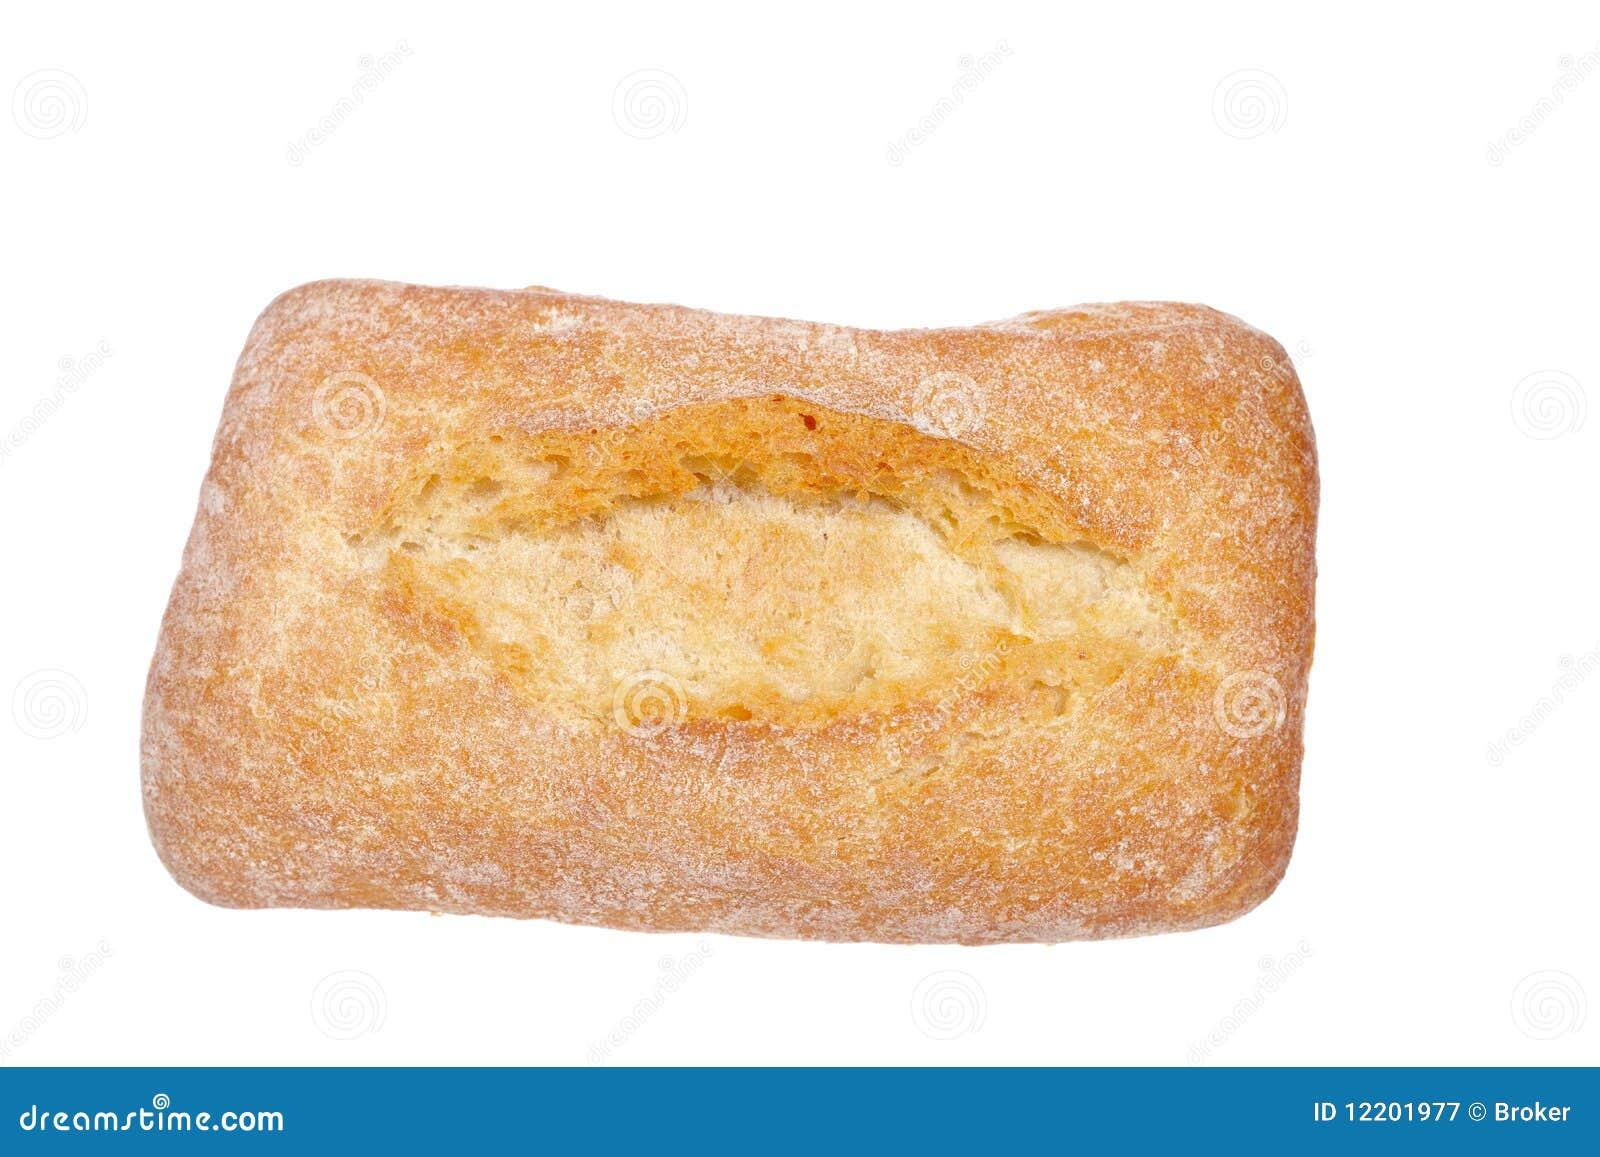 Krustiges Brotbrötchen